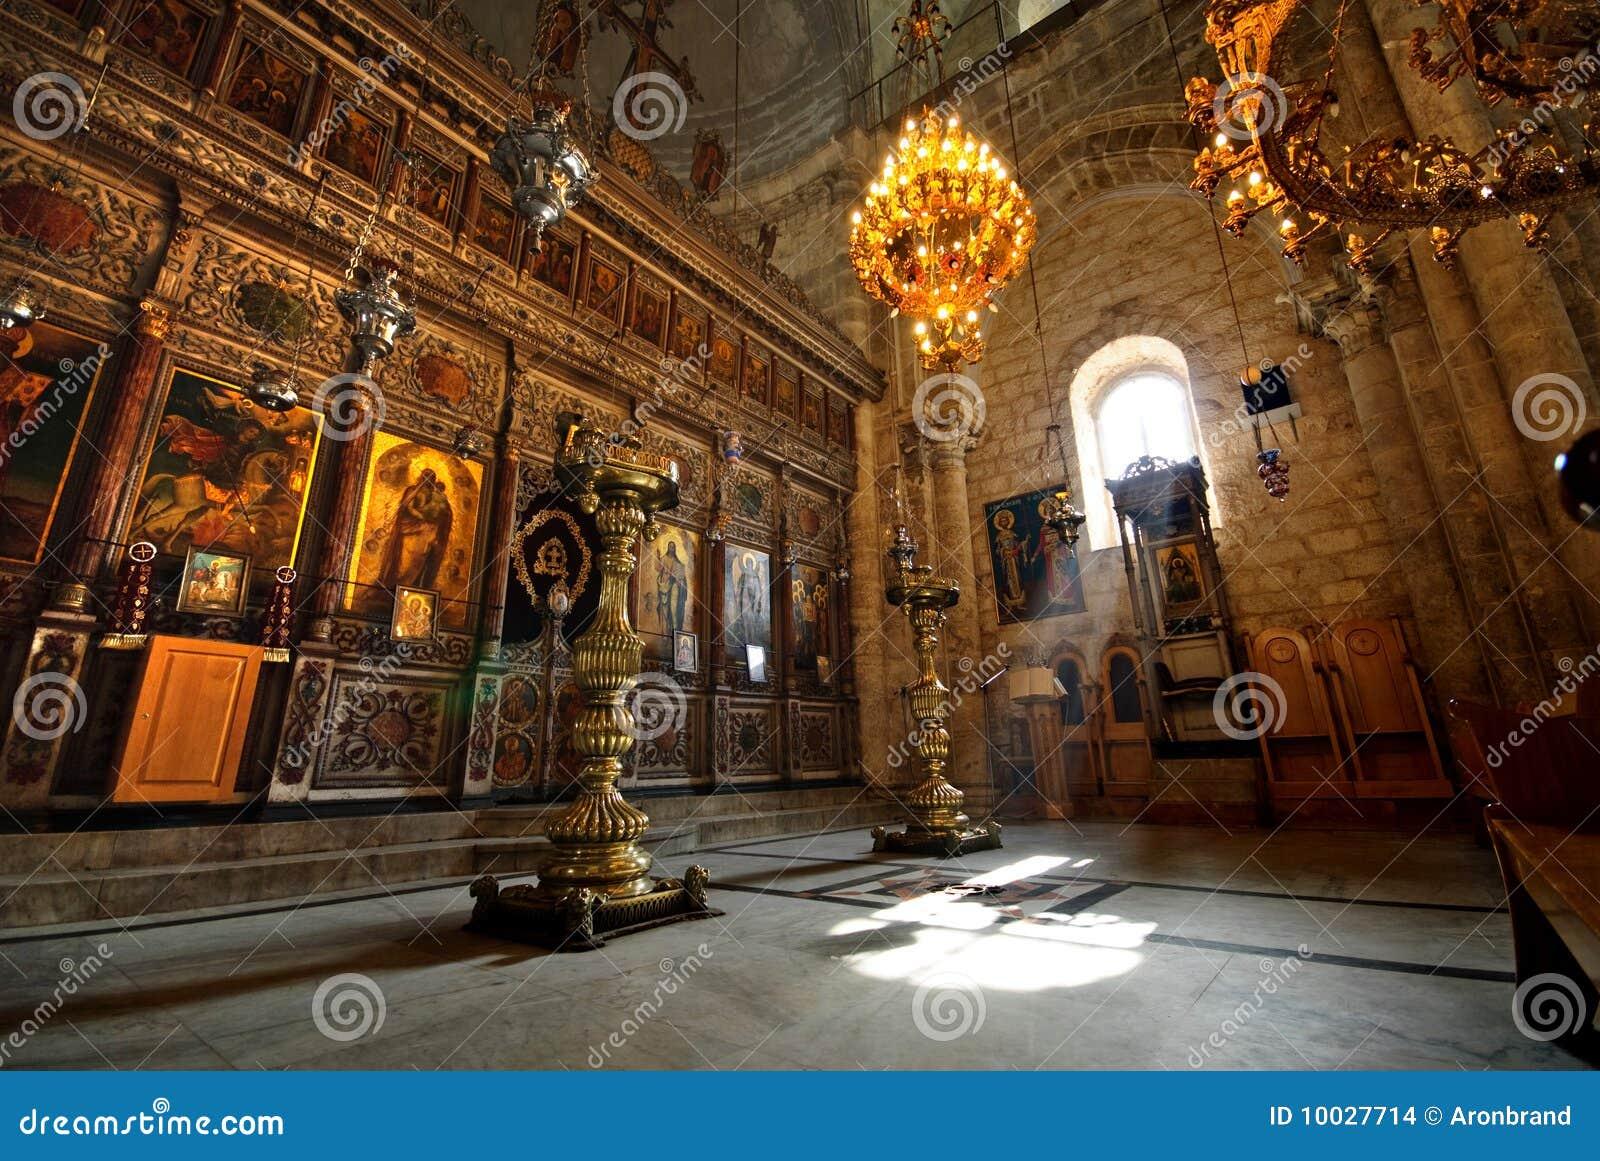 Church of St. George the Dragon Slayer